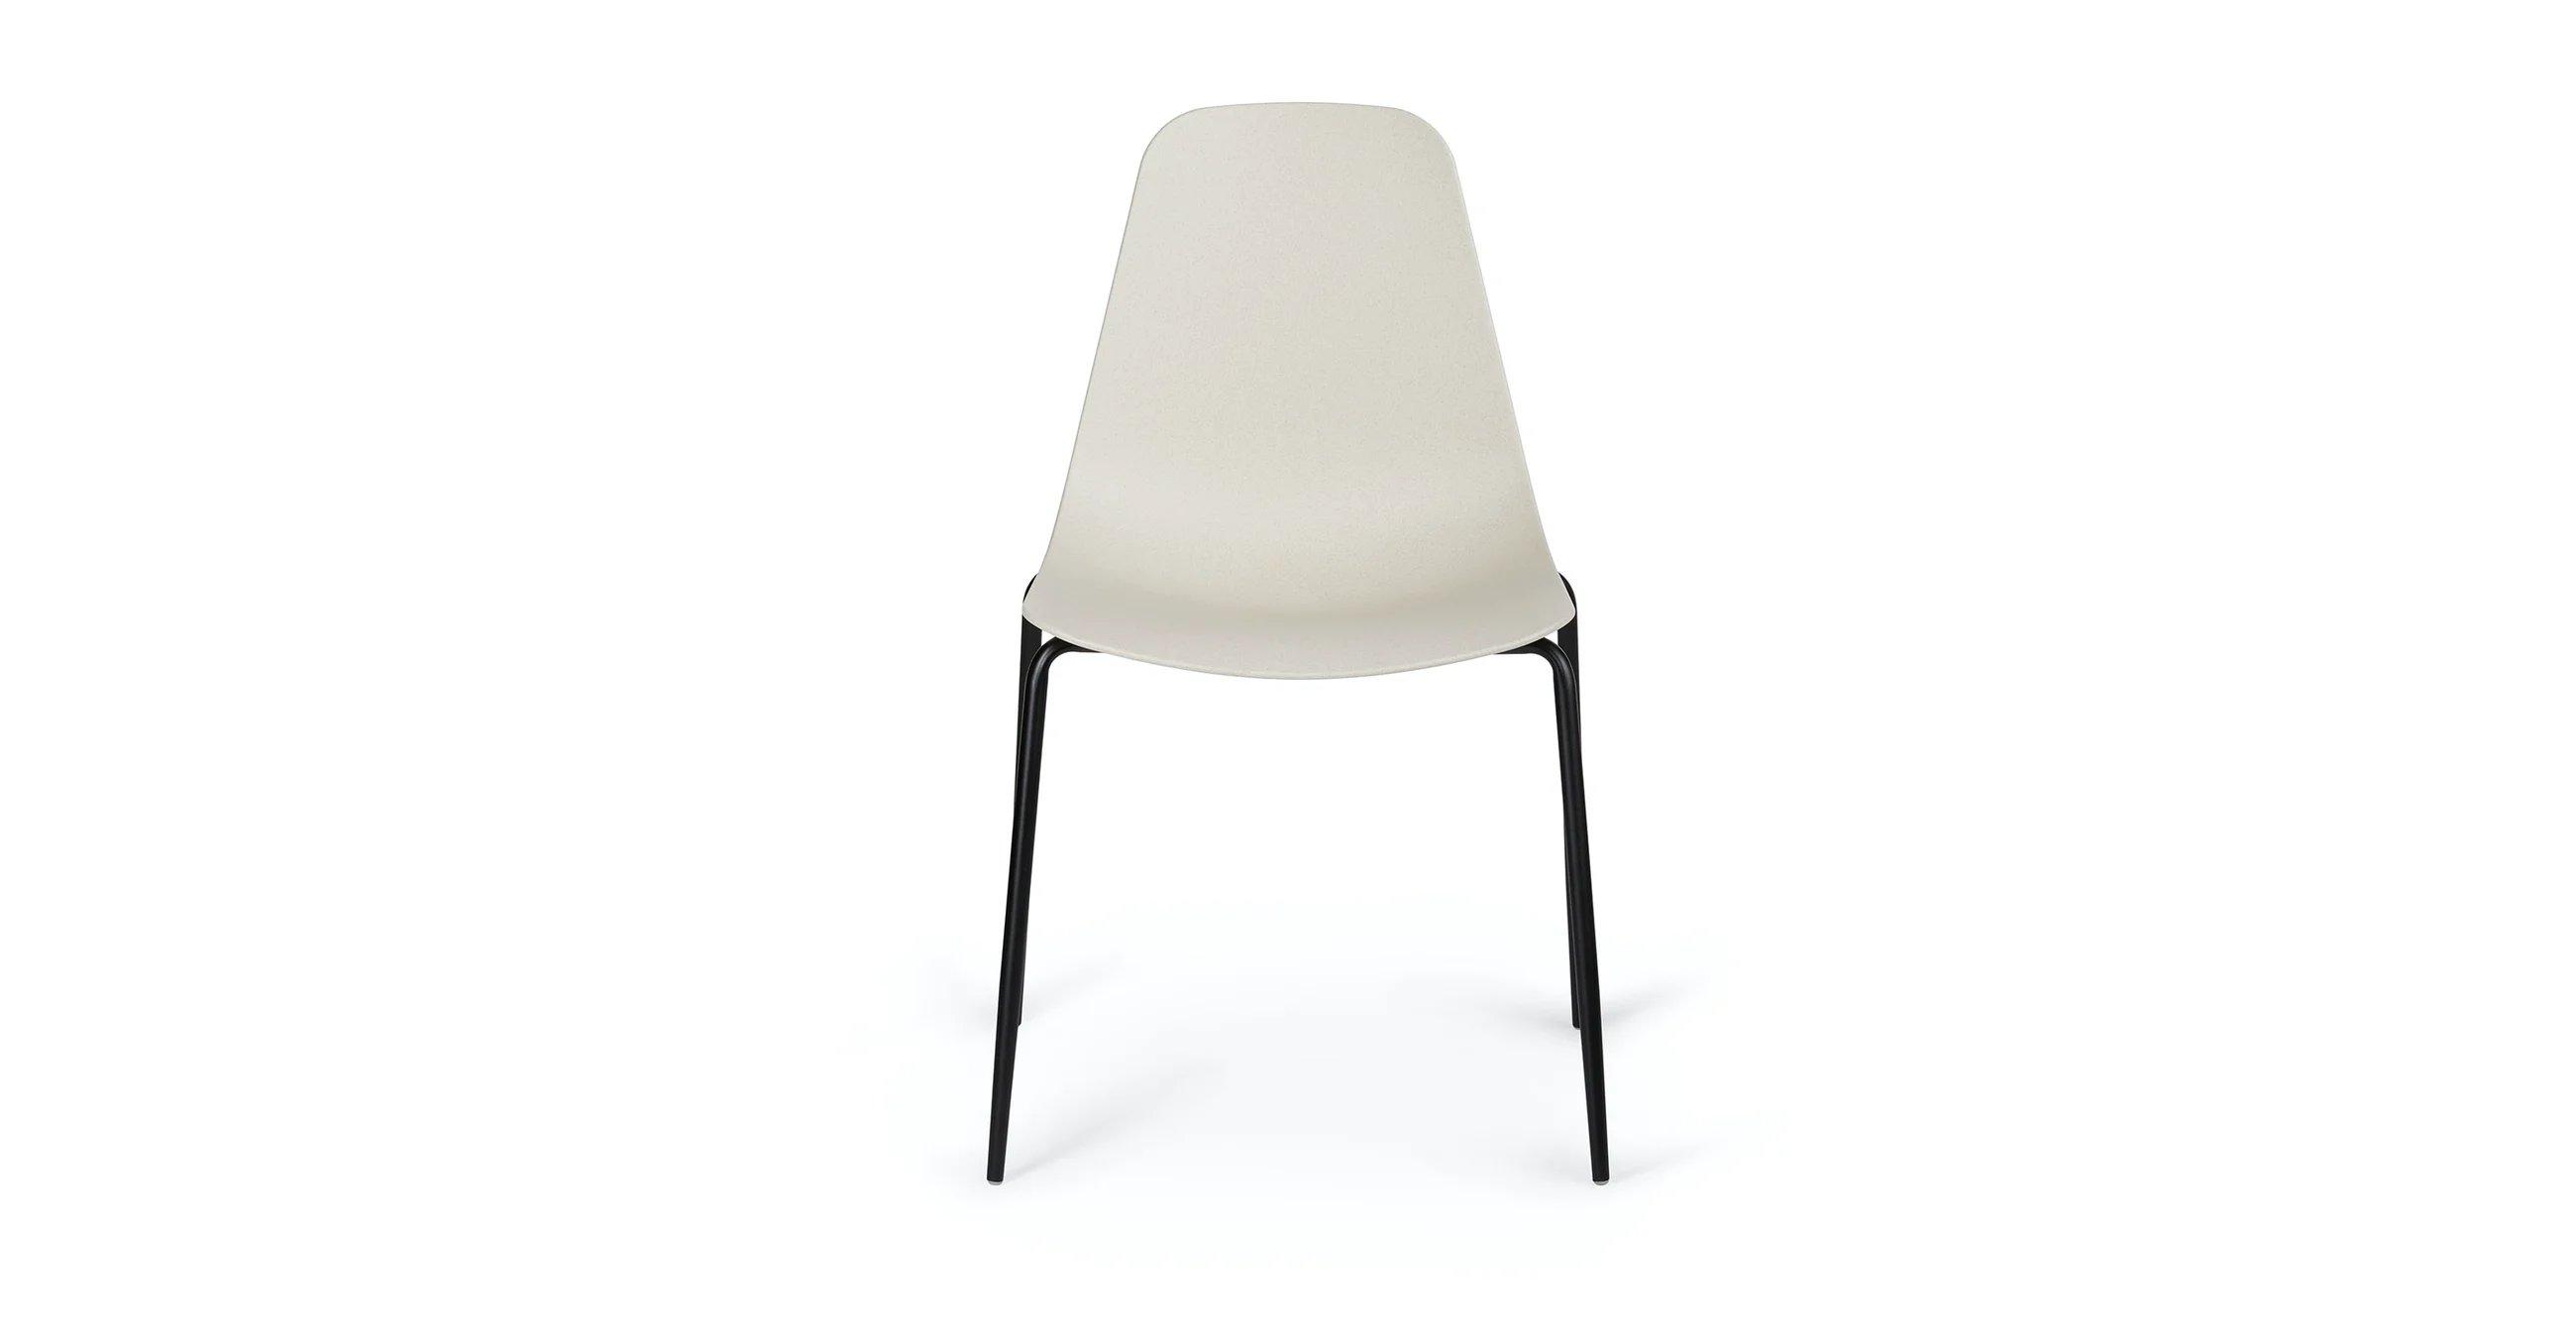 Svelti Grano Fawn Beige Dining Chair, pair